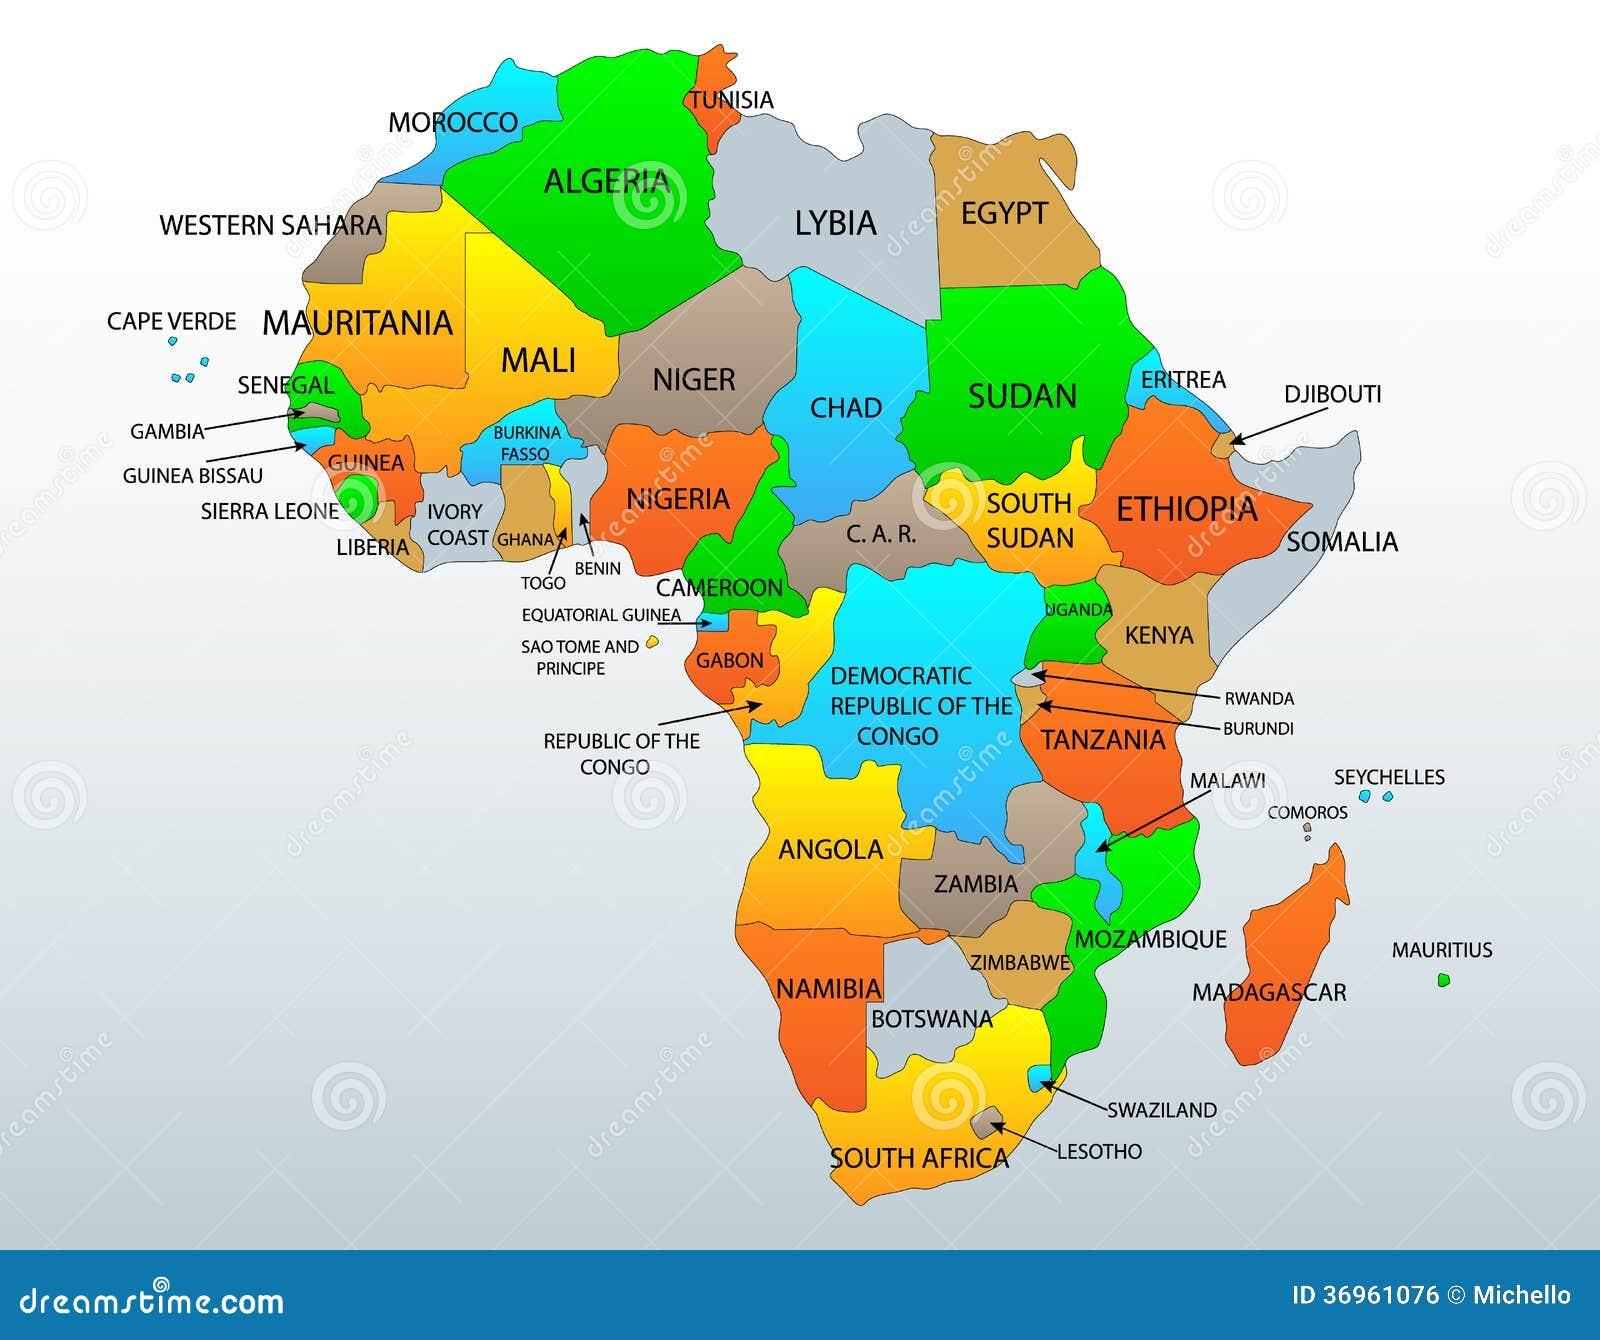 Politikos Xarths Ths Afrikhs Dianysmatikh Apeikonish